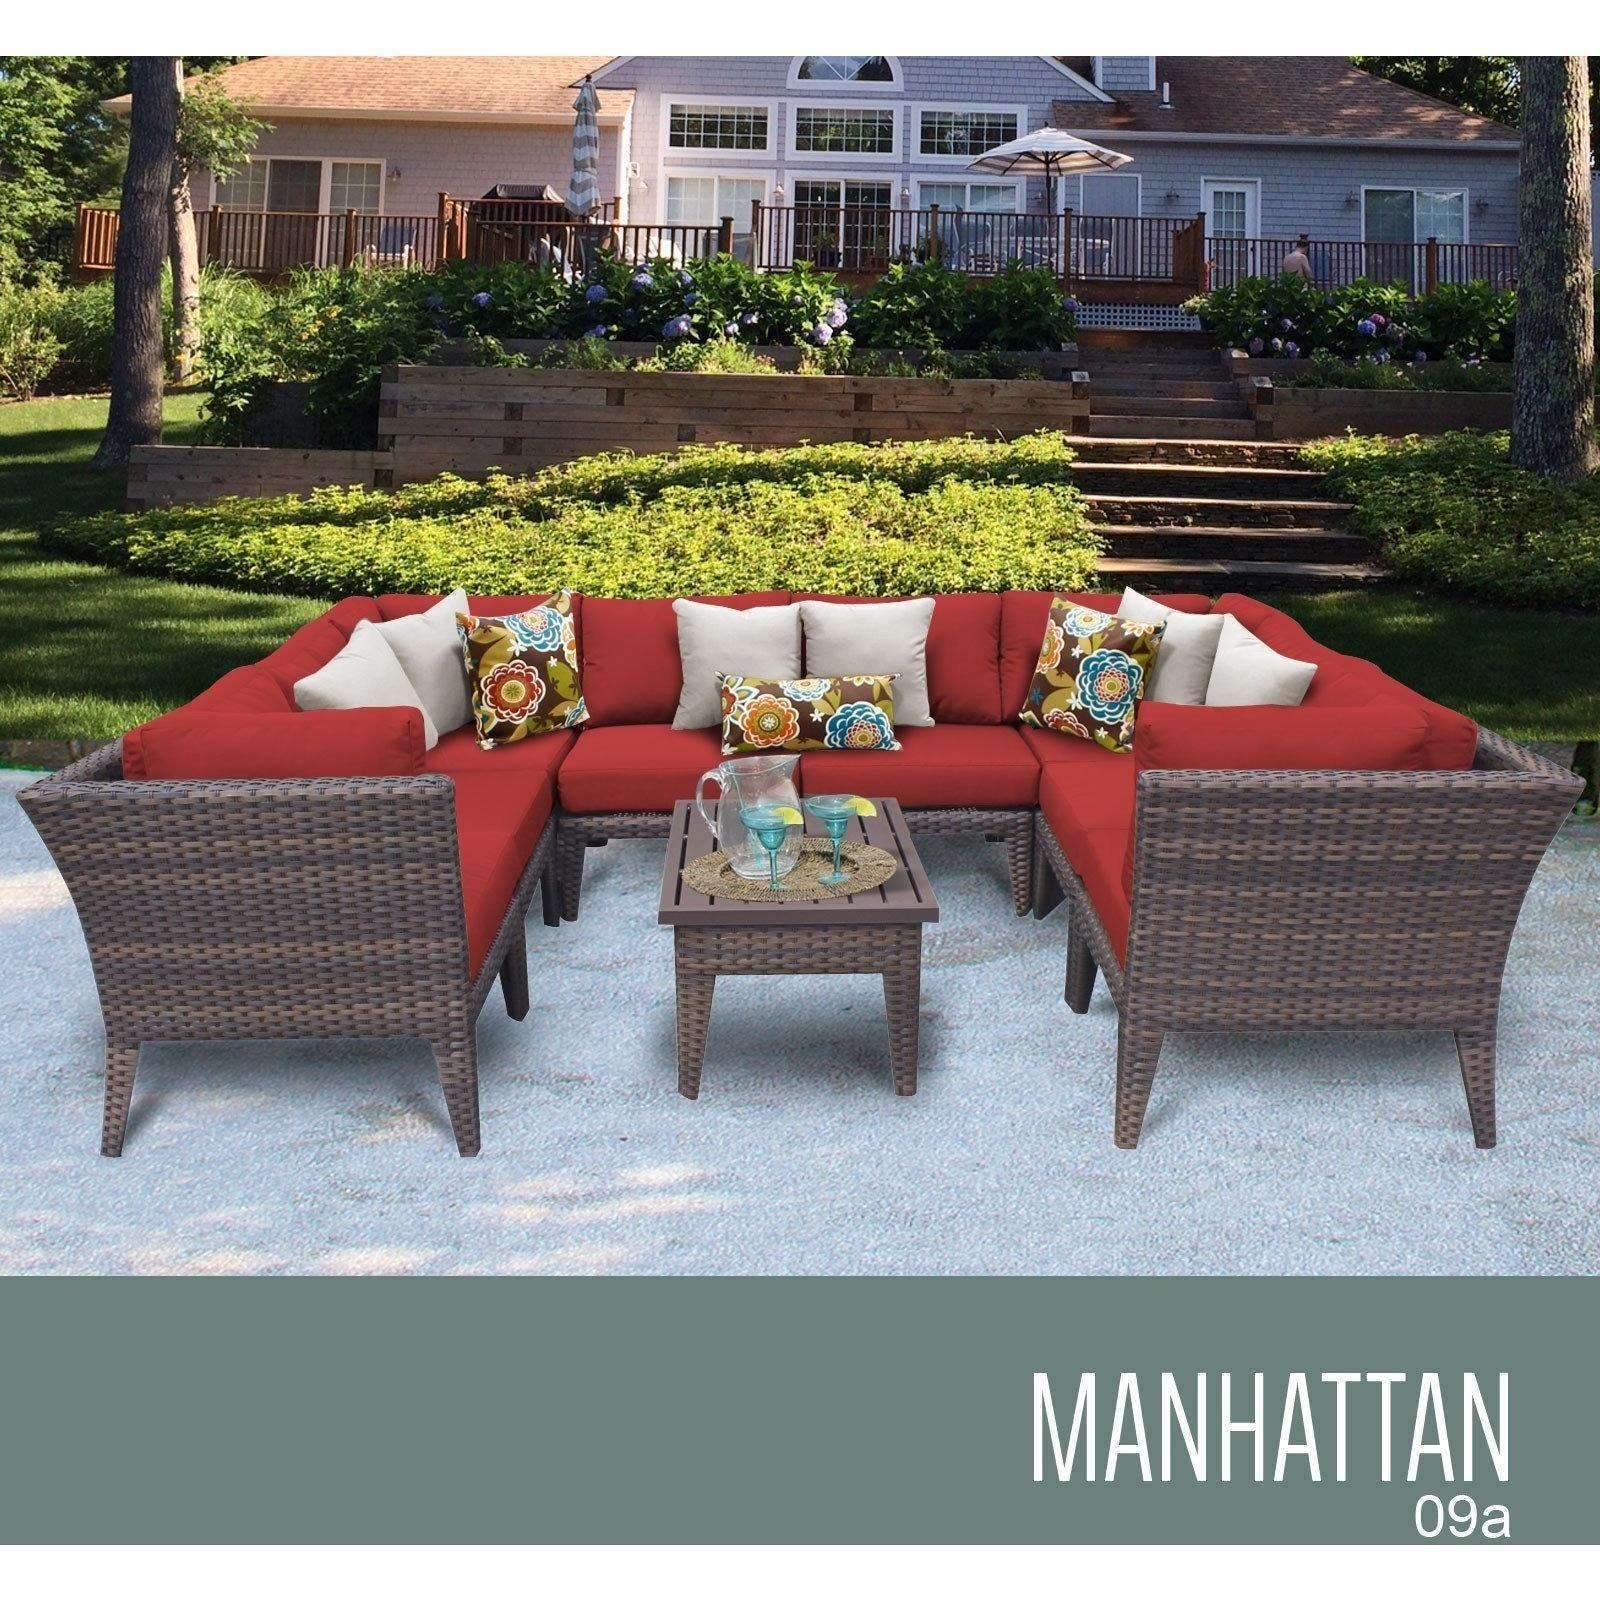 Manhattan 9 Piece Outdoor Wicker Patio Furniture Set 09a